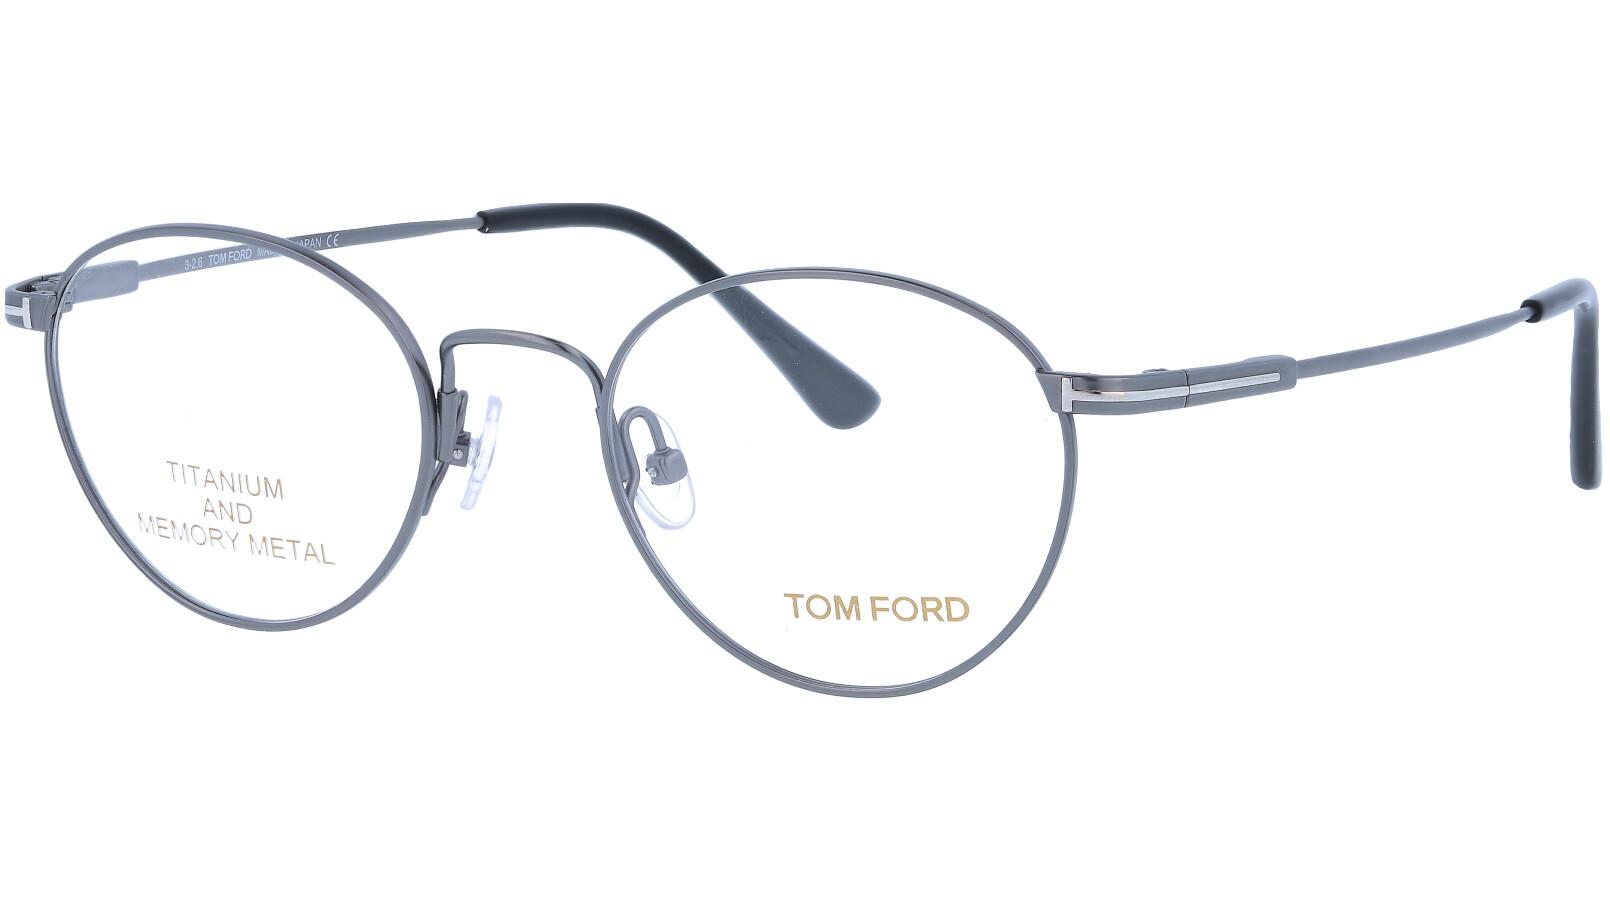 TOM FORD FT5418 009 47 SILVER Glasses